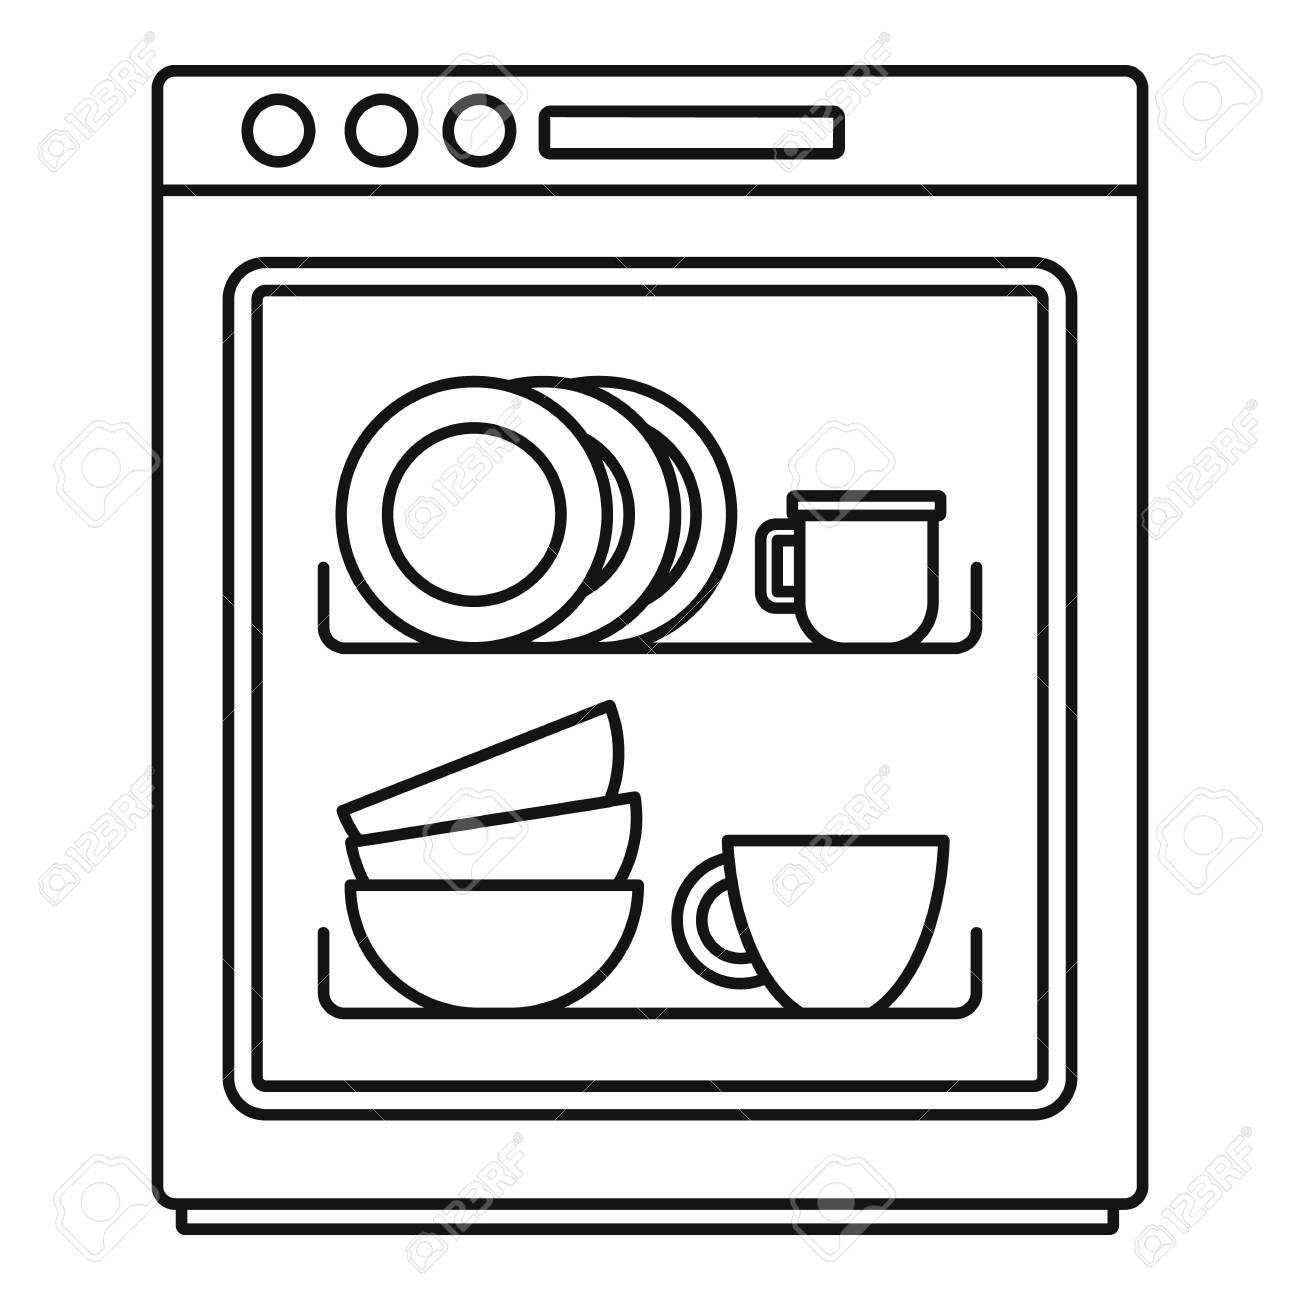 dishwasher icon outline illustration